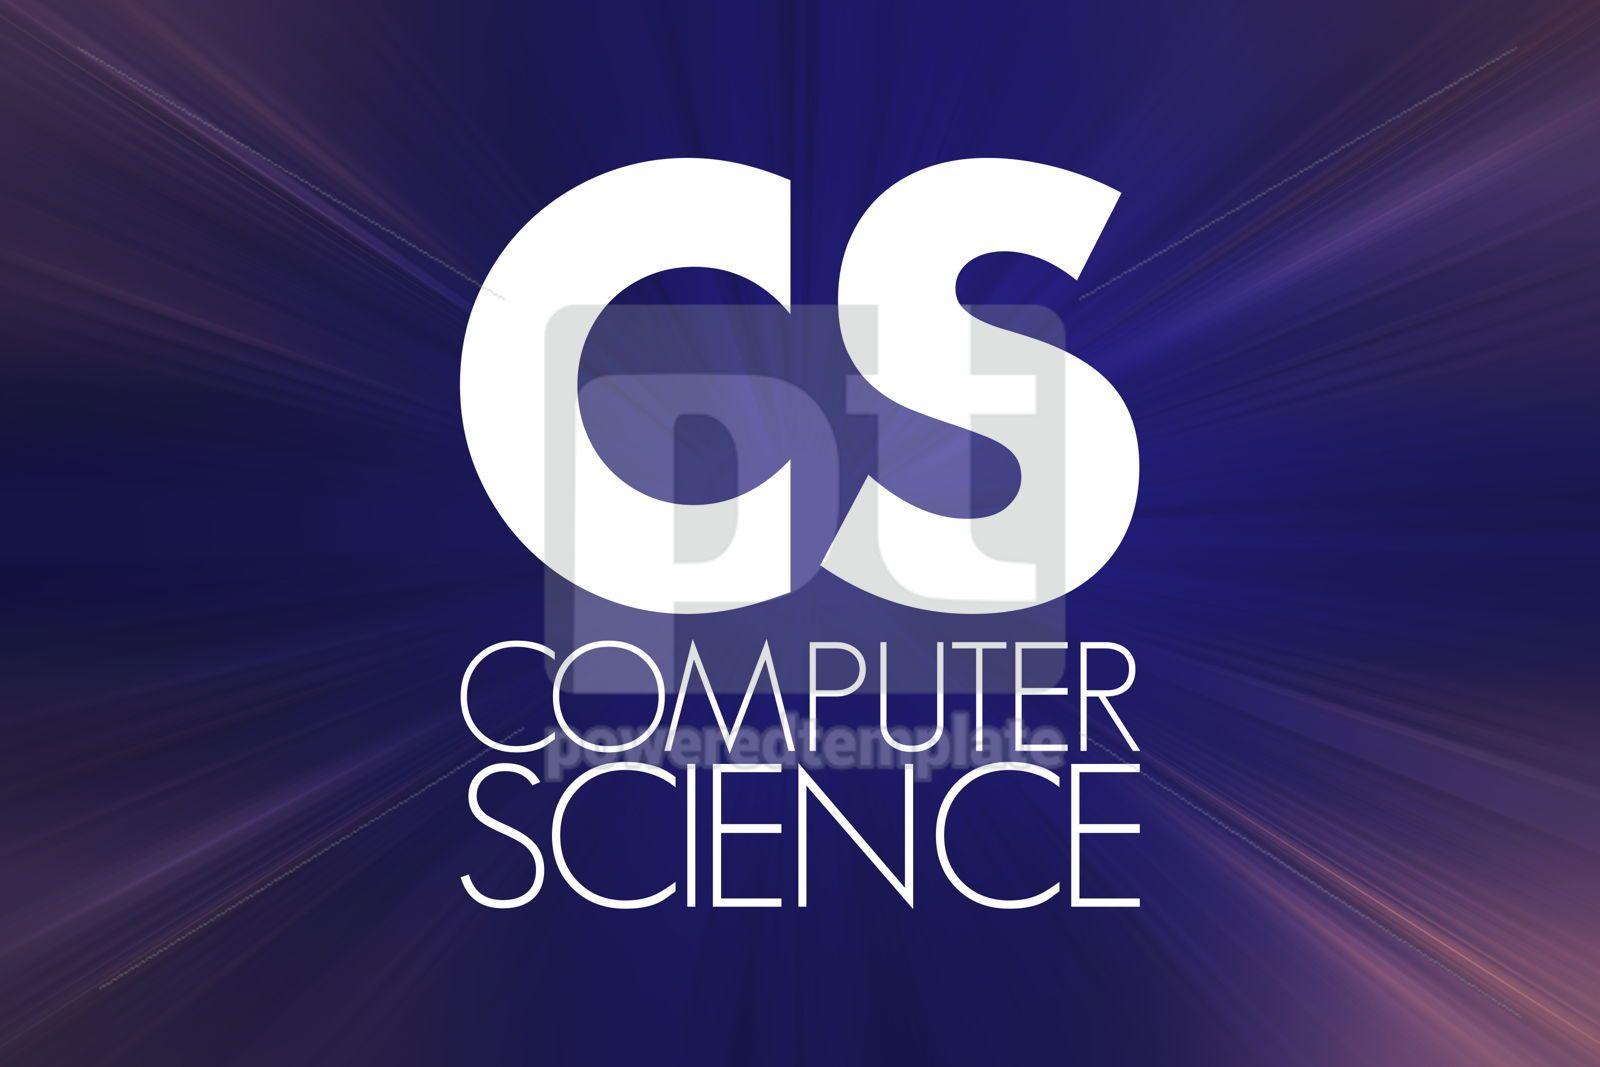 CS - Computer Science acronym technology concept background, 16858, Business — PoweredTemplate.com